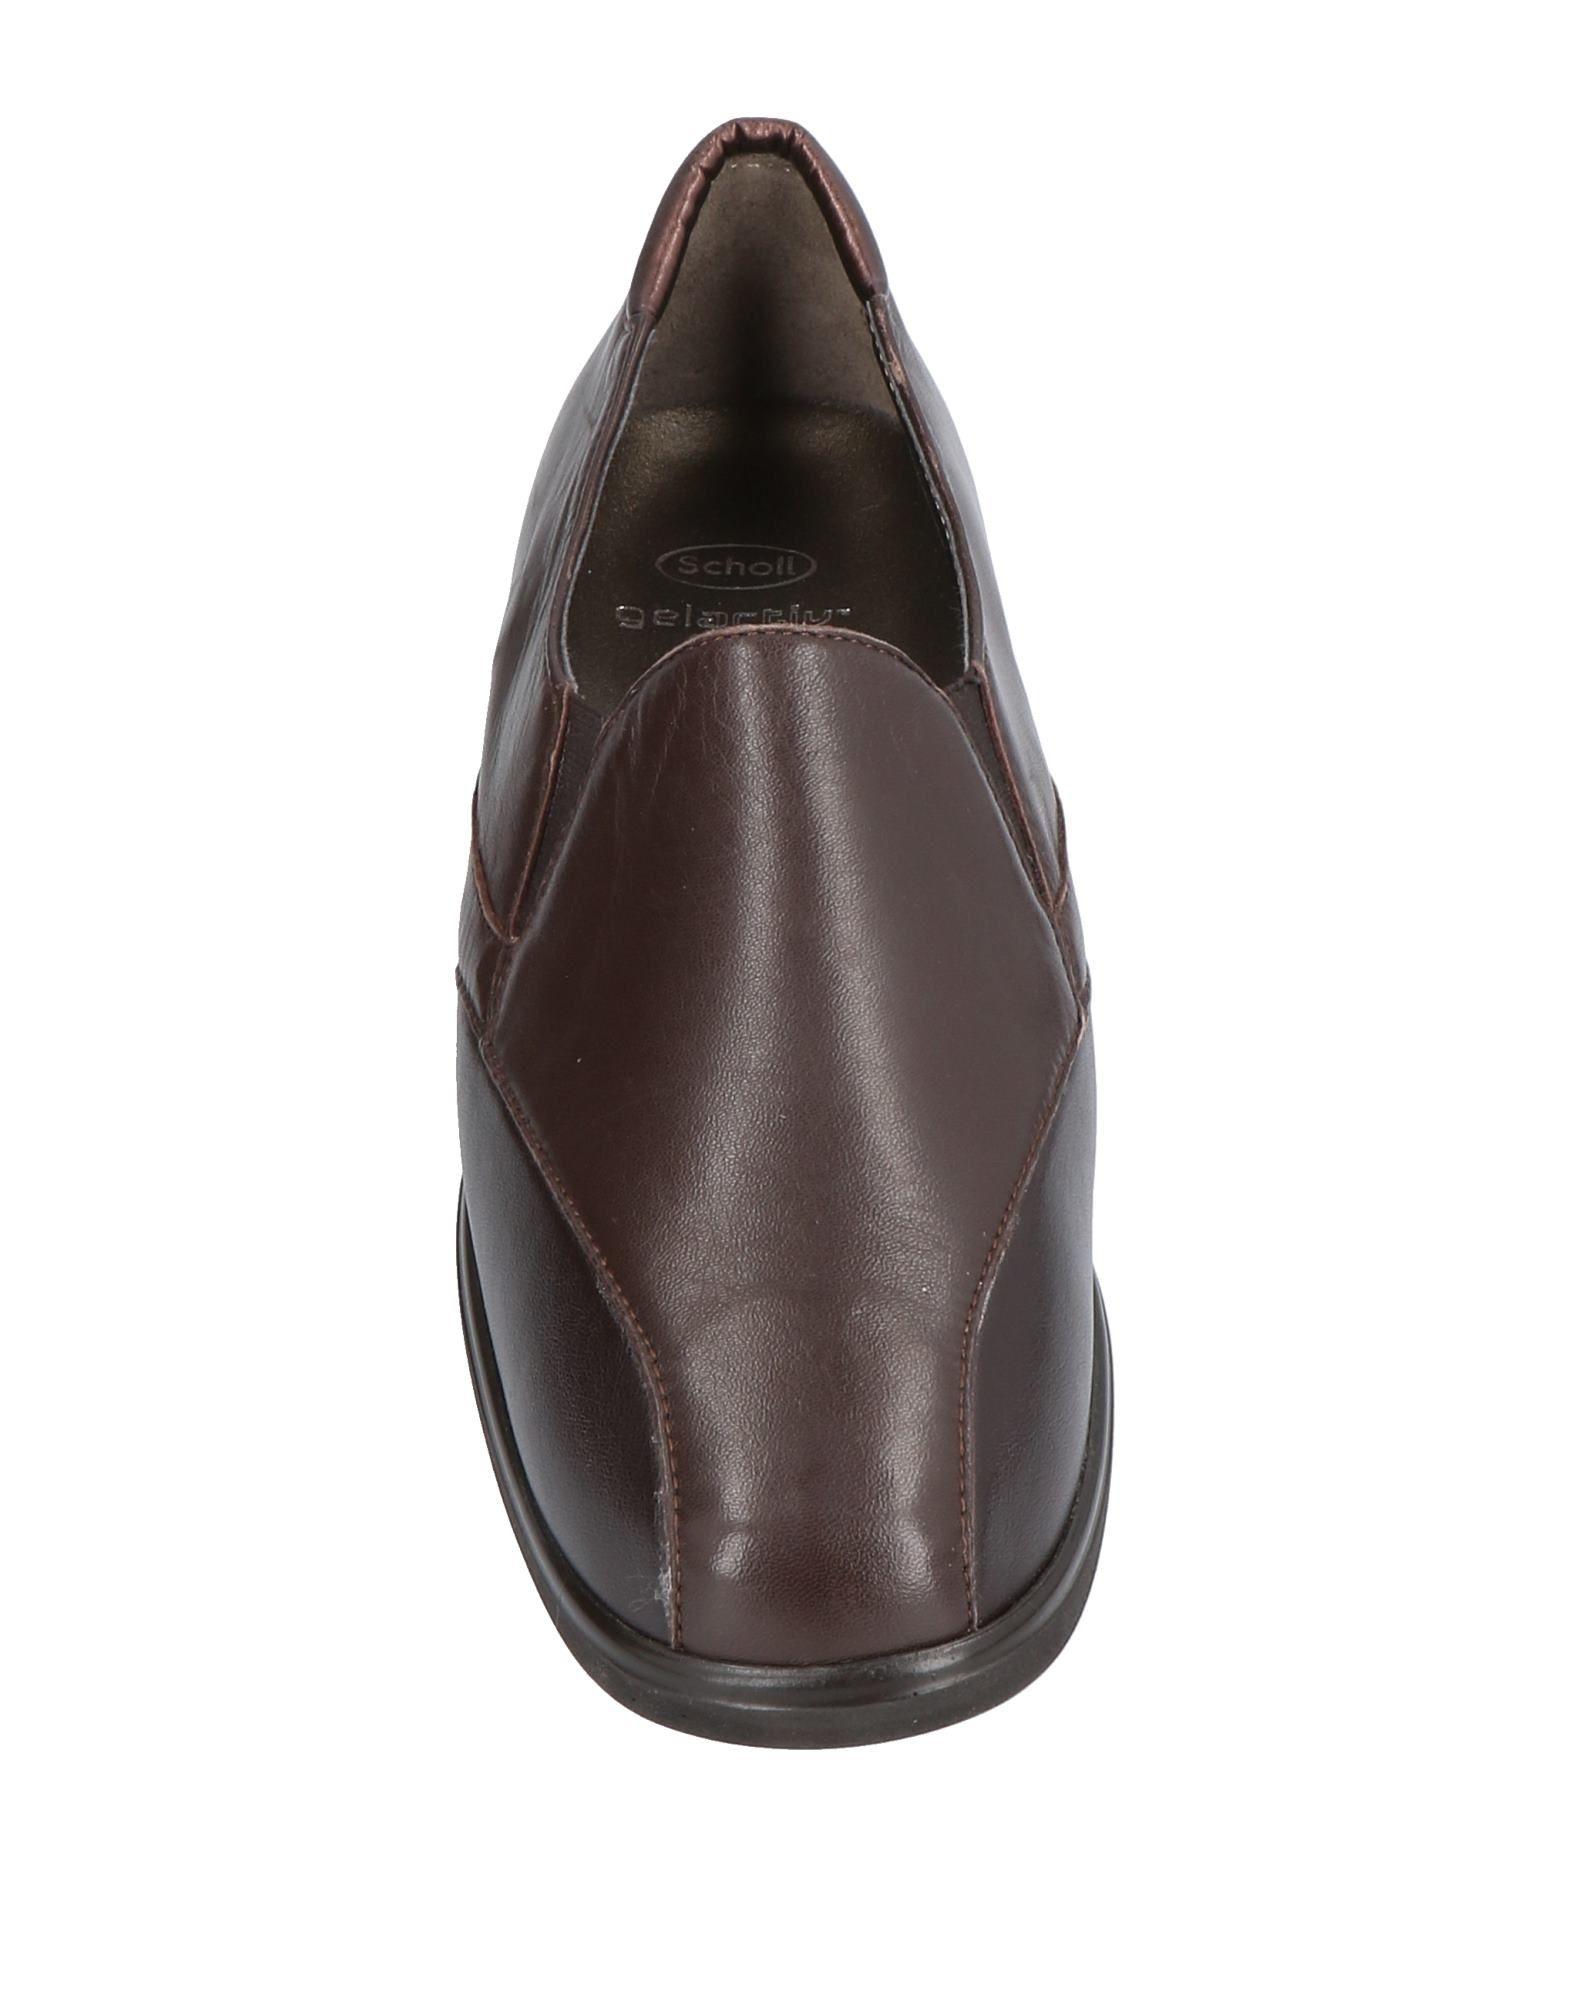 Scholl Mokassins Damen  11481693NL Heiße Heiße Heiße Schuhe f4df80